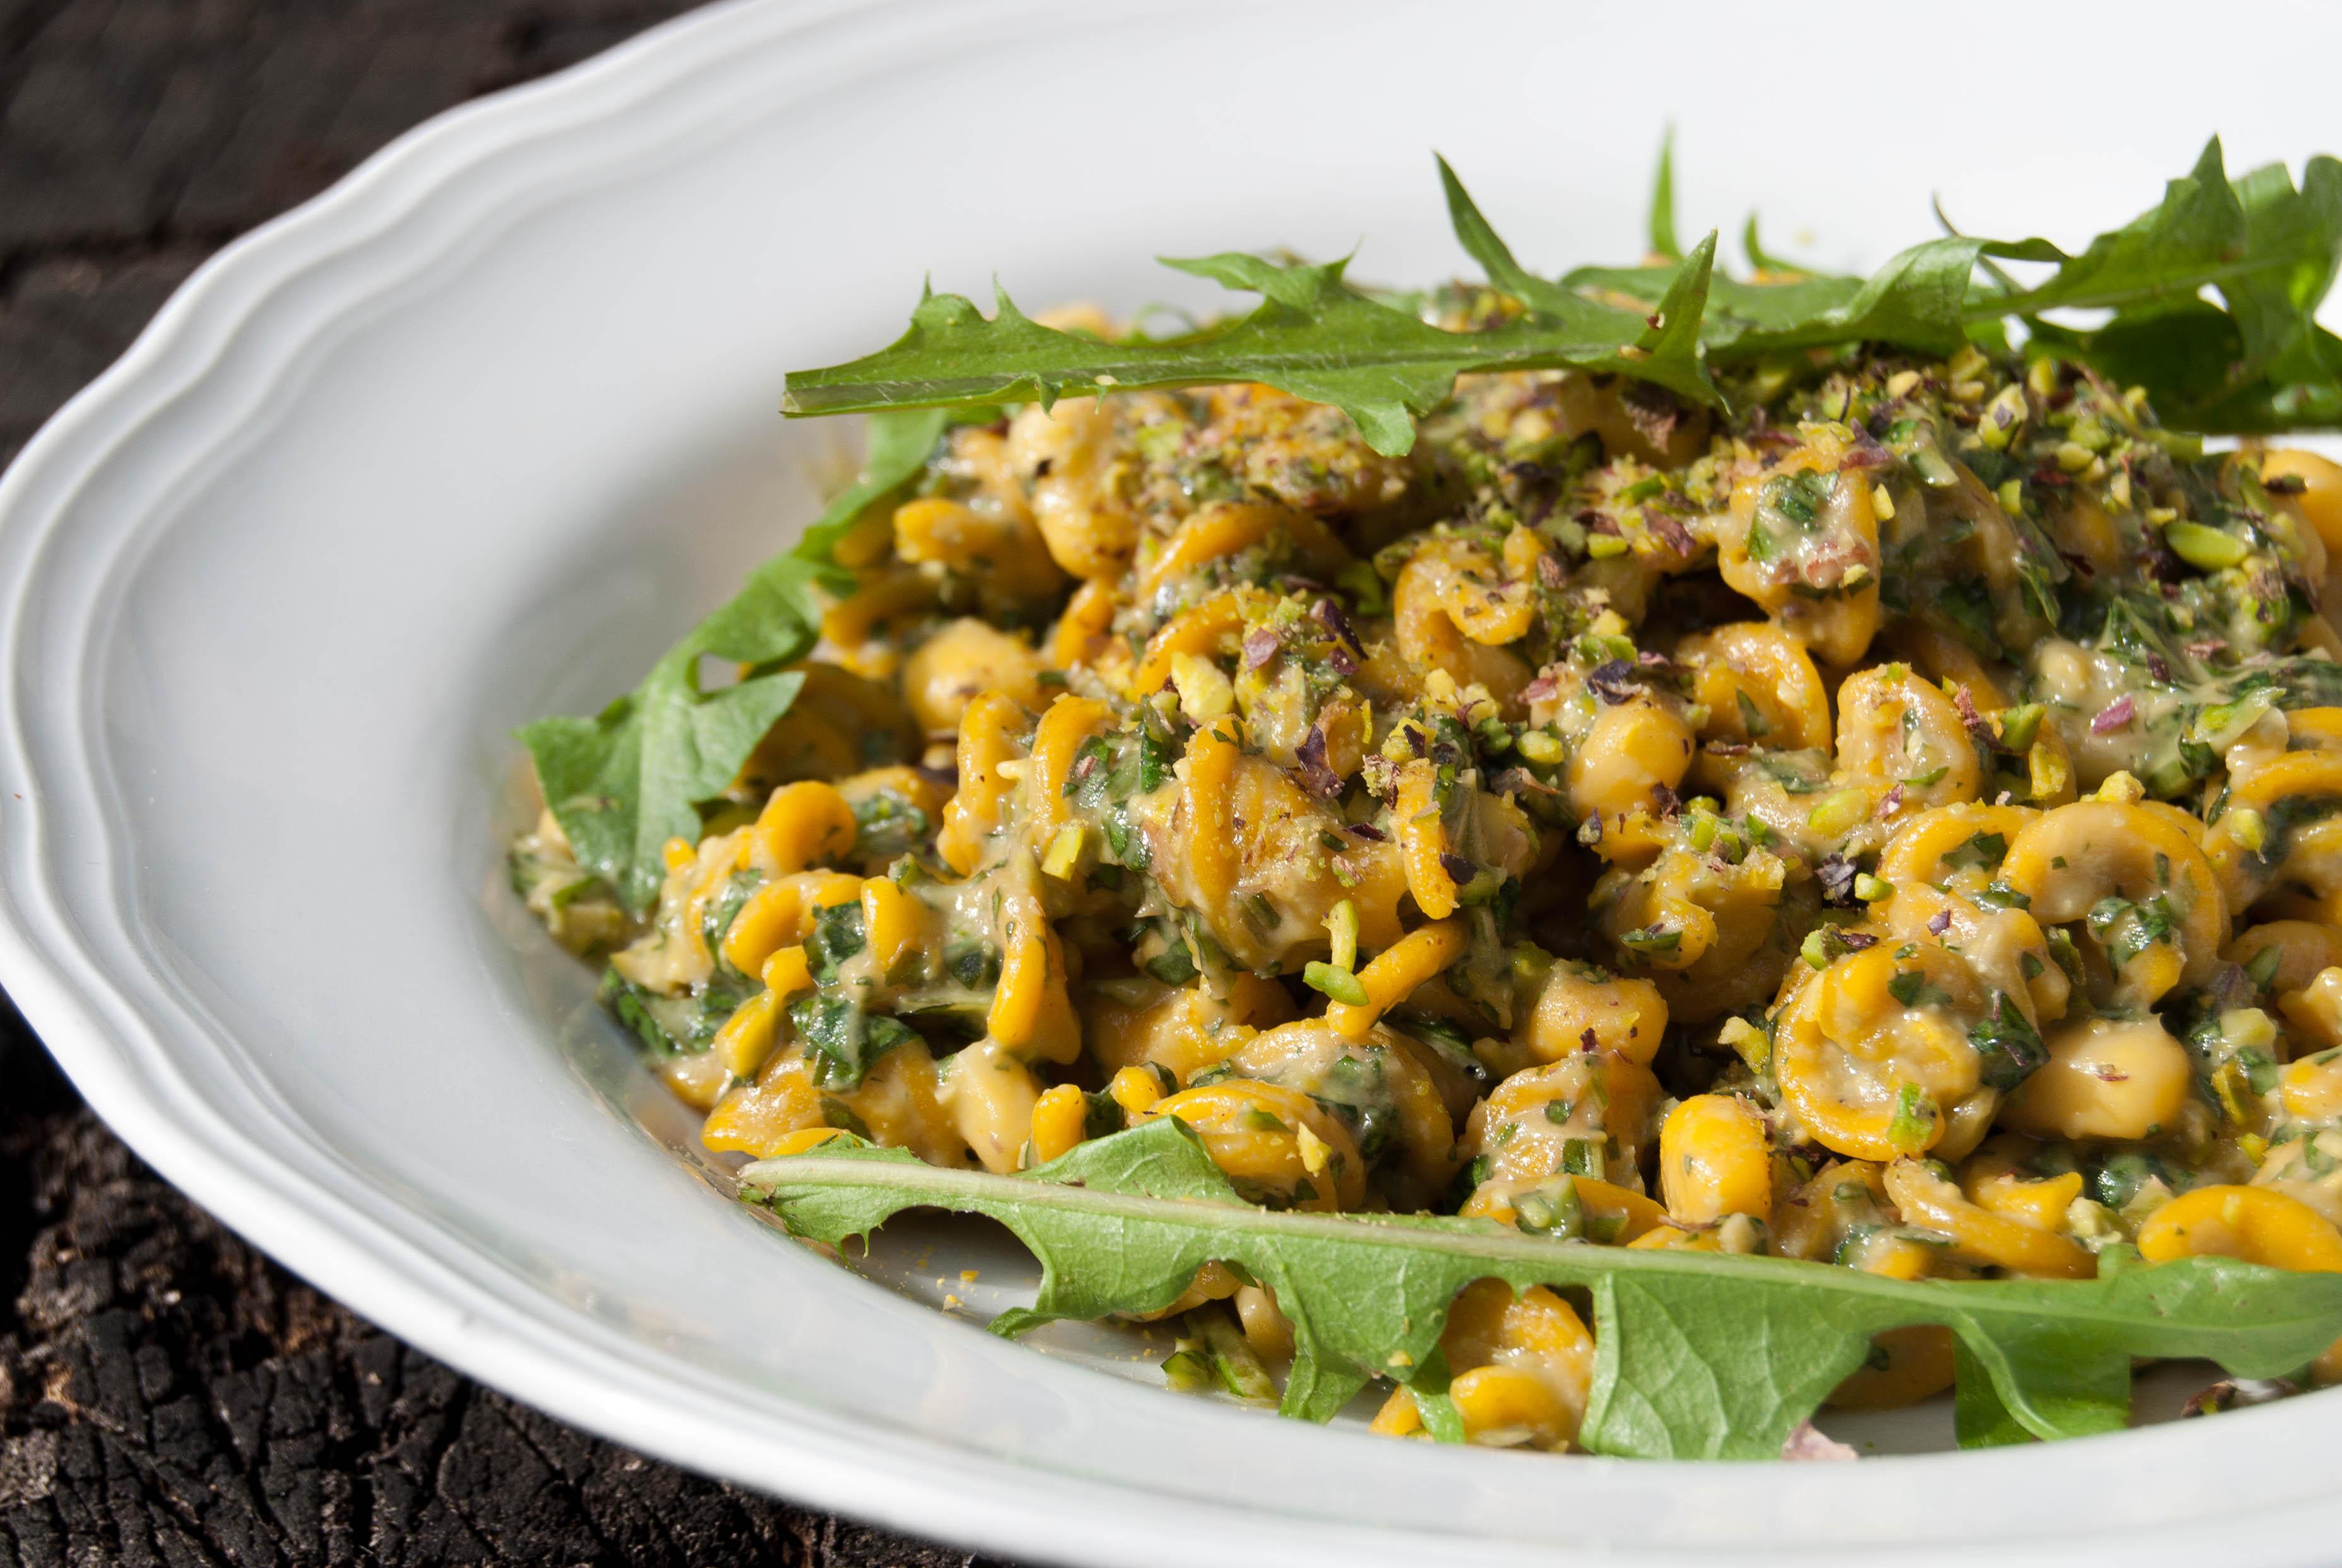 Avocado, pistachio e dandelion pesto